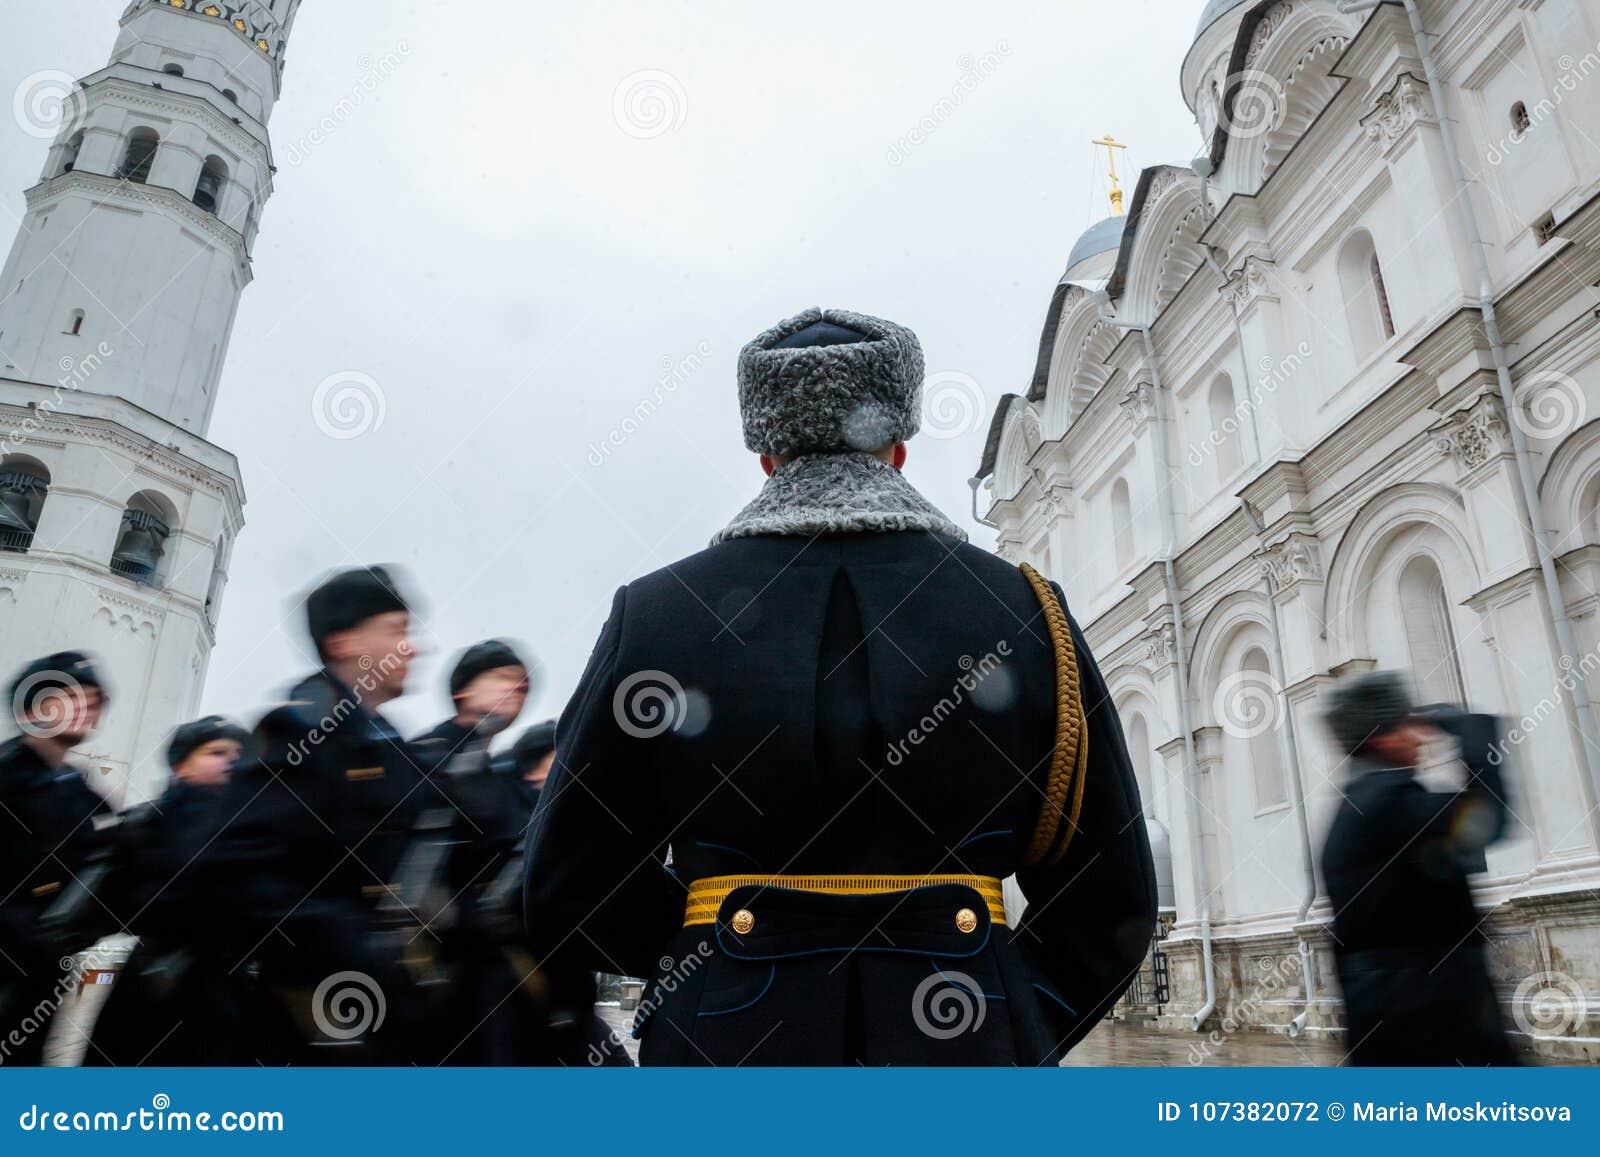 Za paradą Prezydencki pułk usługa Moskwa Kremlin's Commandant